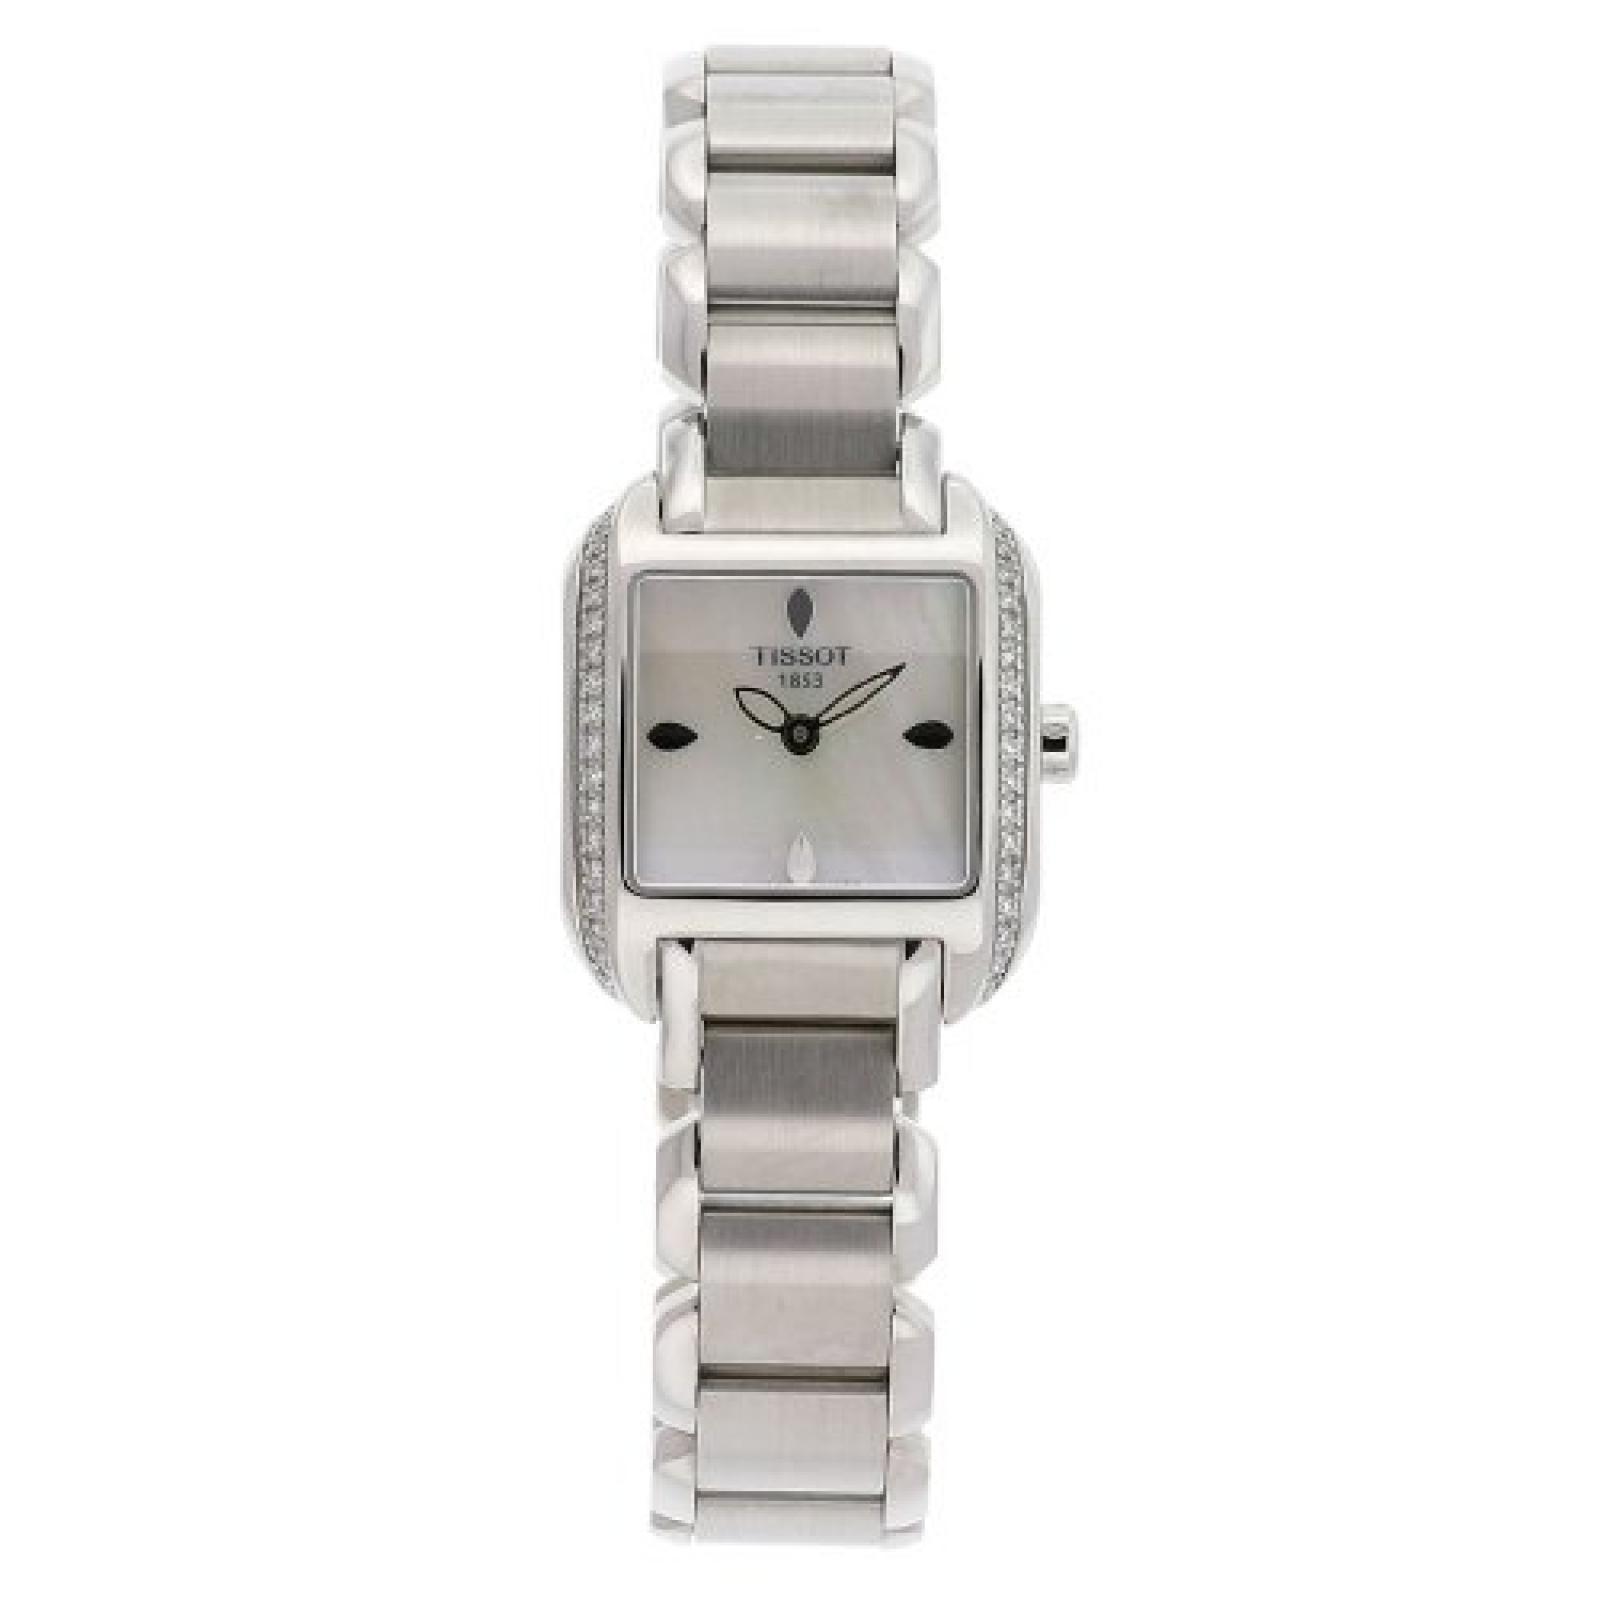 Tissot Damen-Armbanduhr T-Wave T 02138571